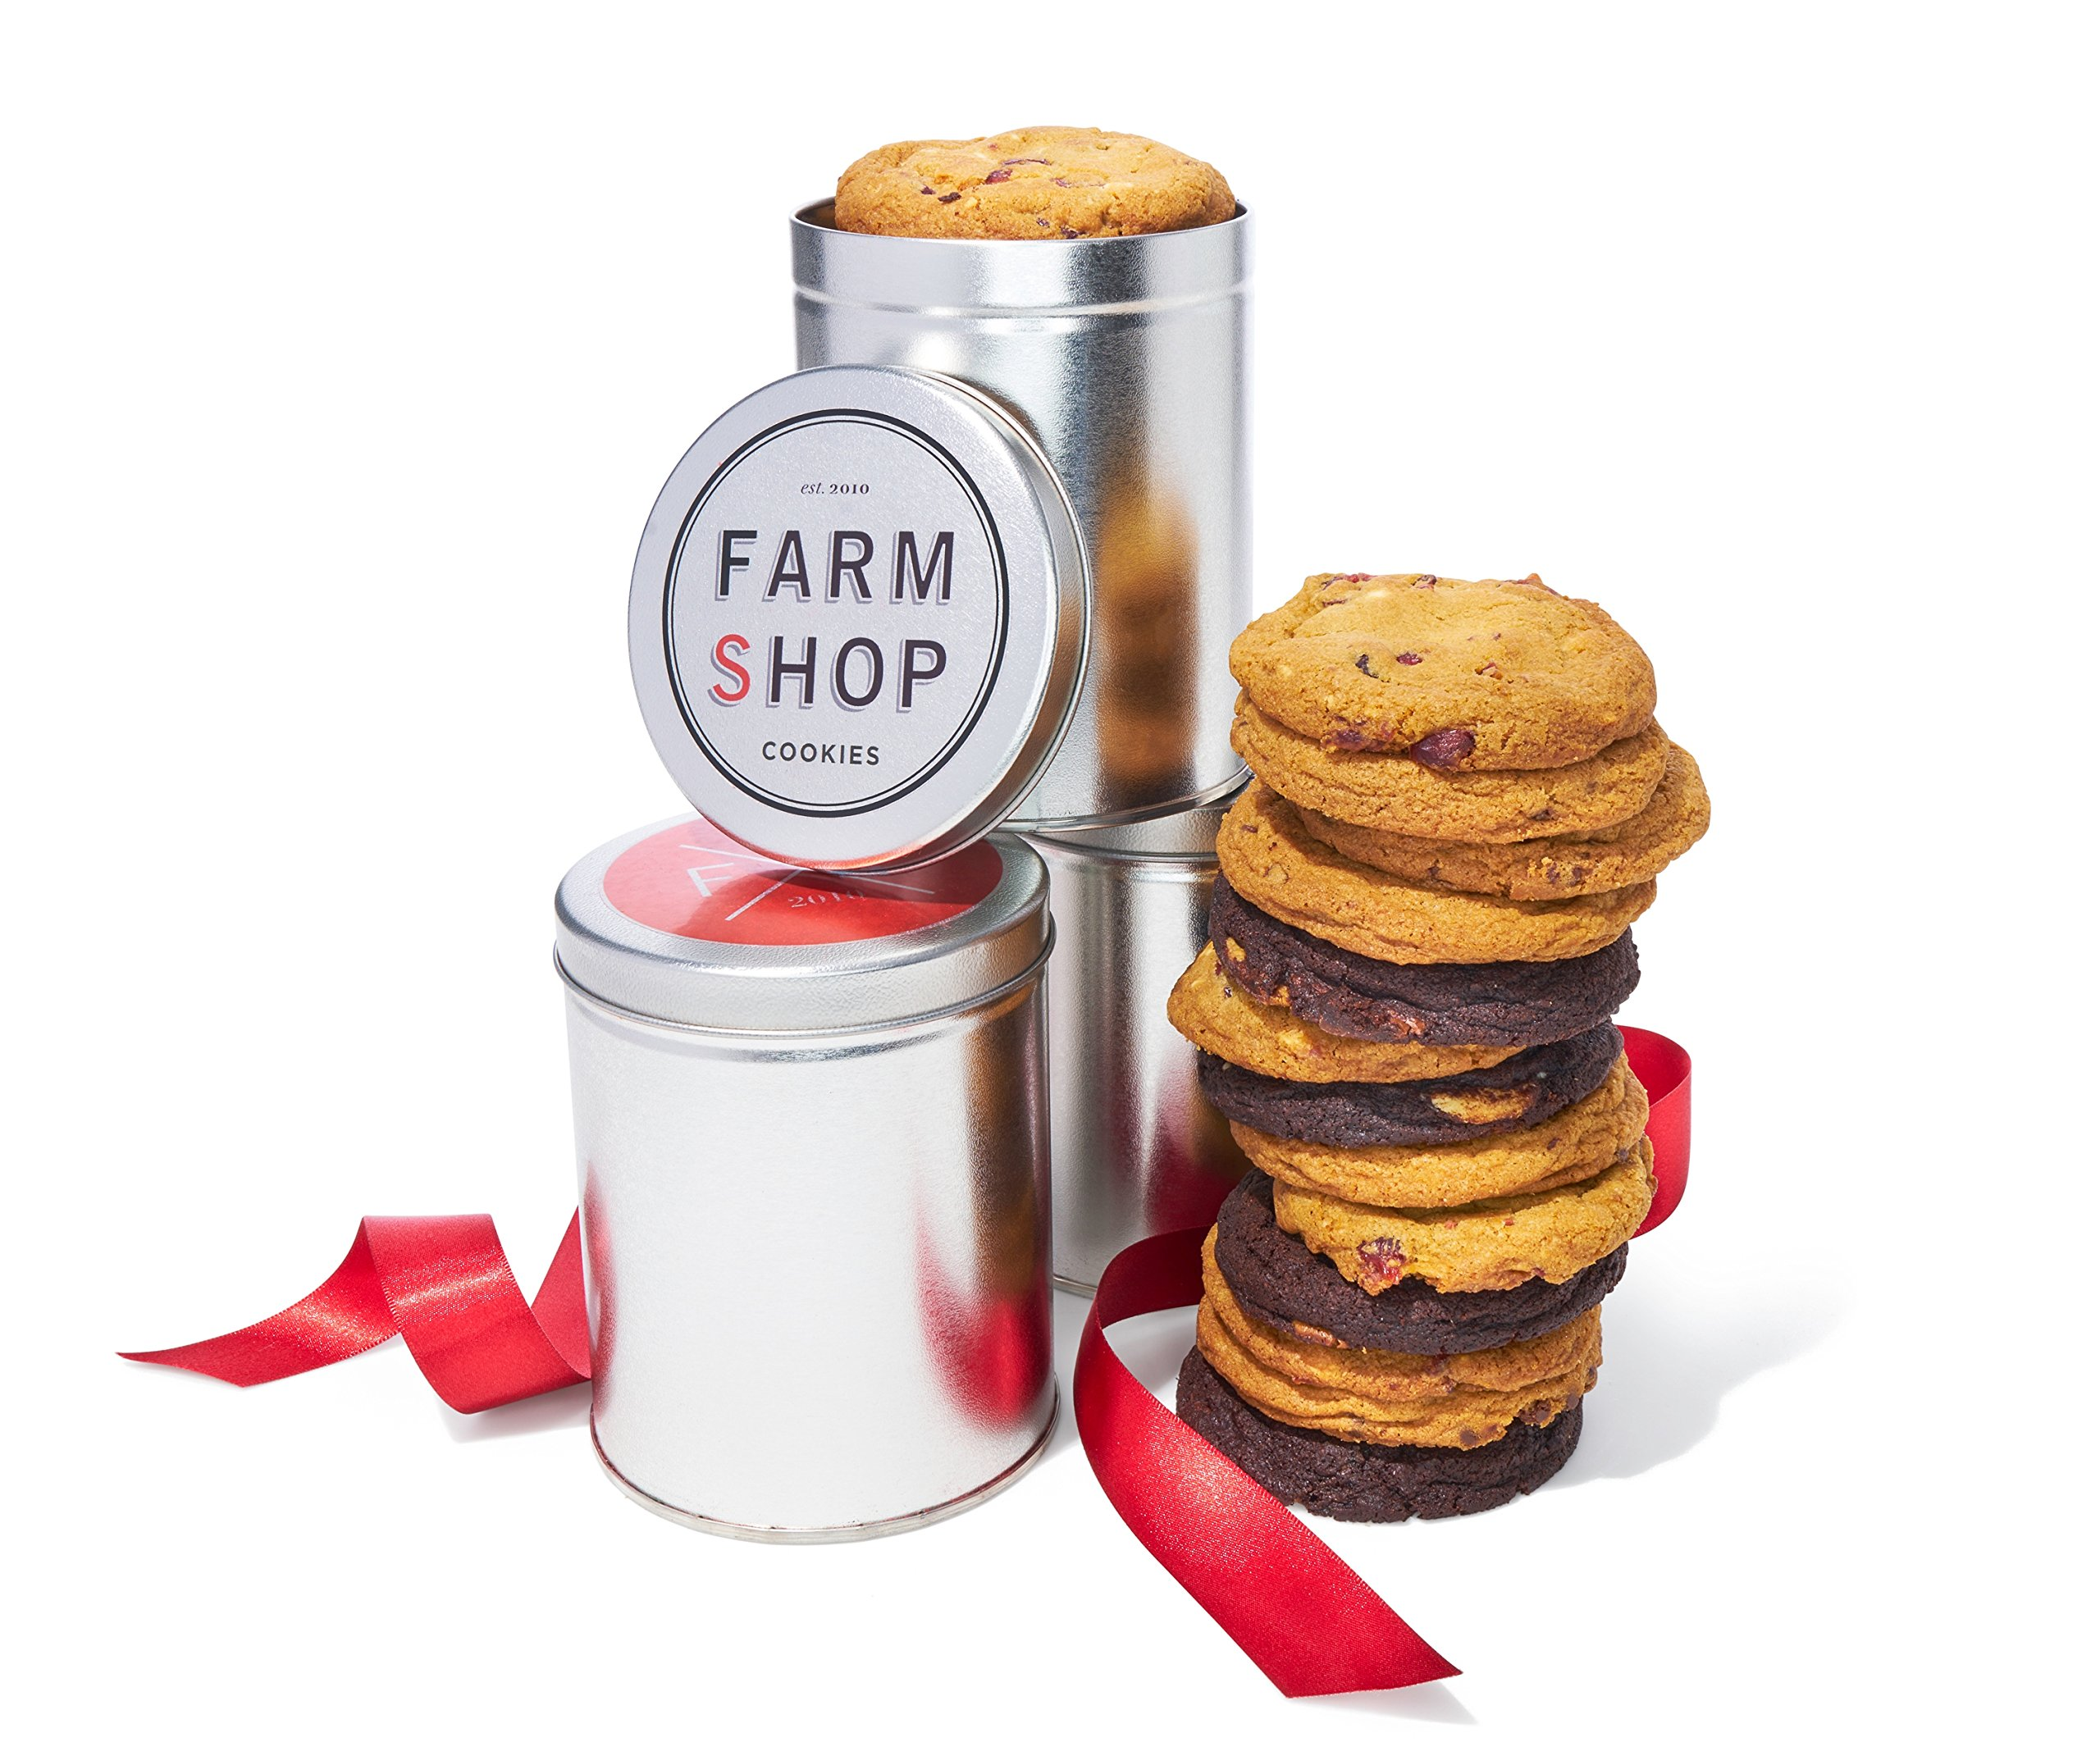 Farmshop Cookie Collection